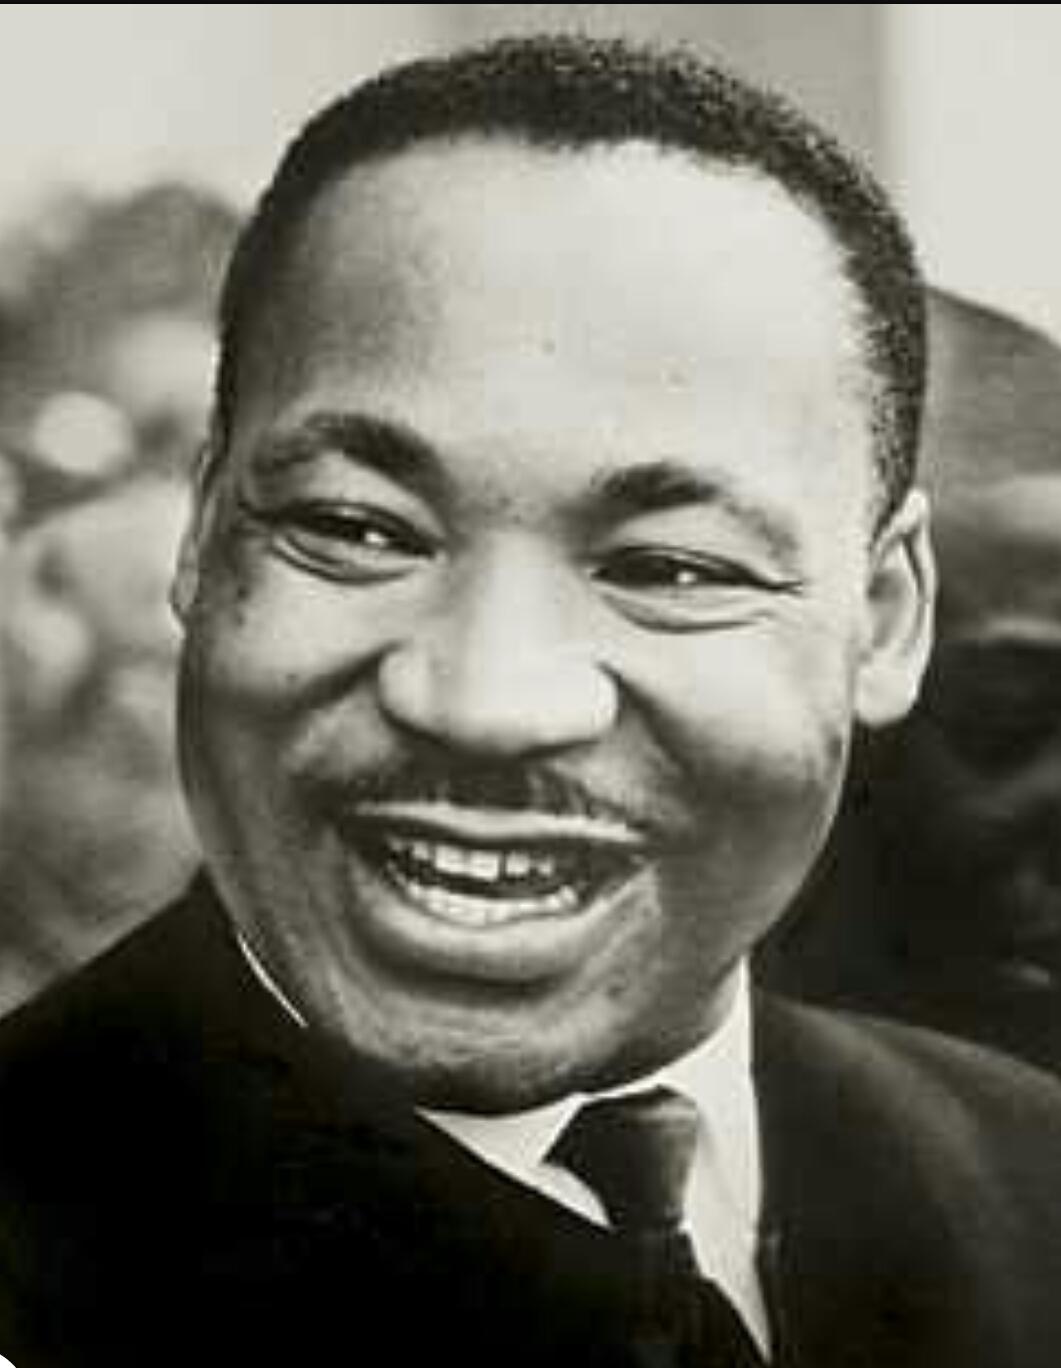 Martin Luther King Jr. Civil Rights Activist              1929-1968